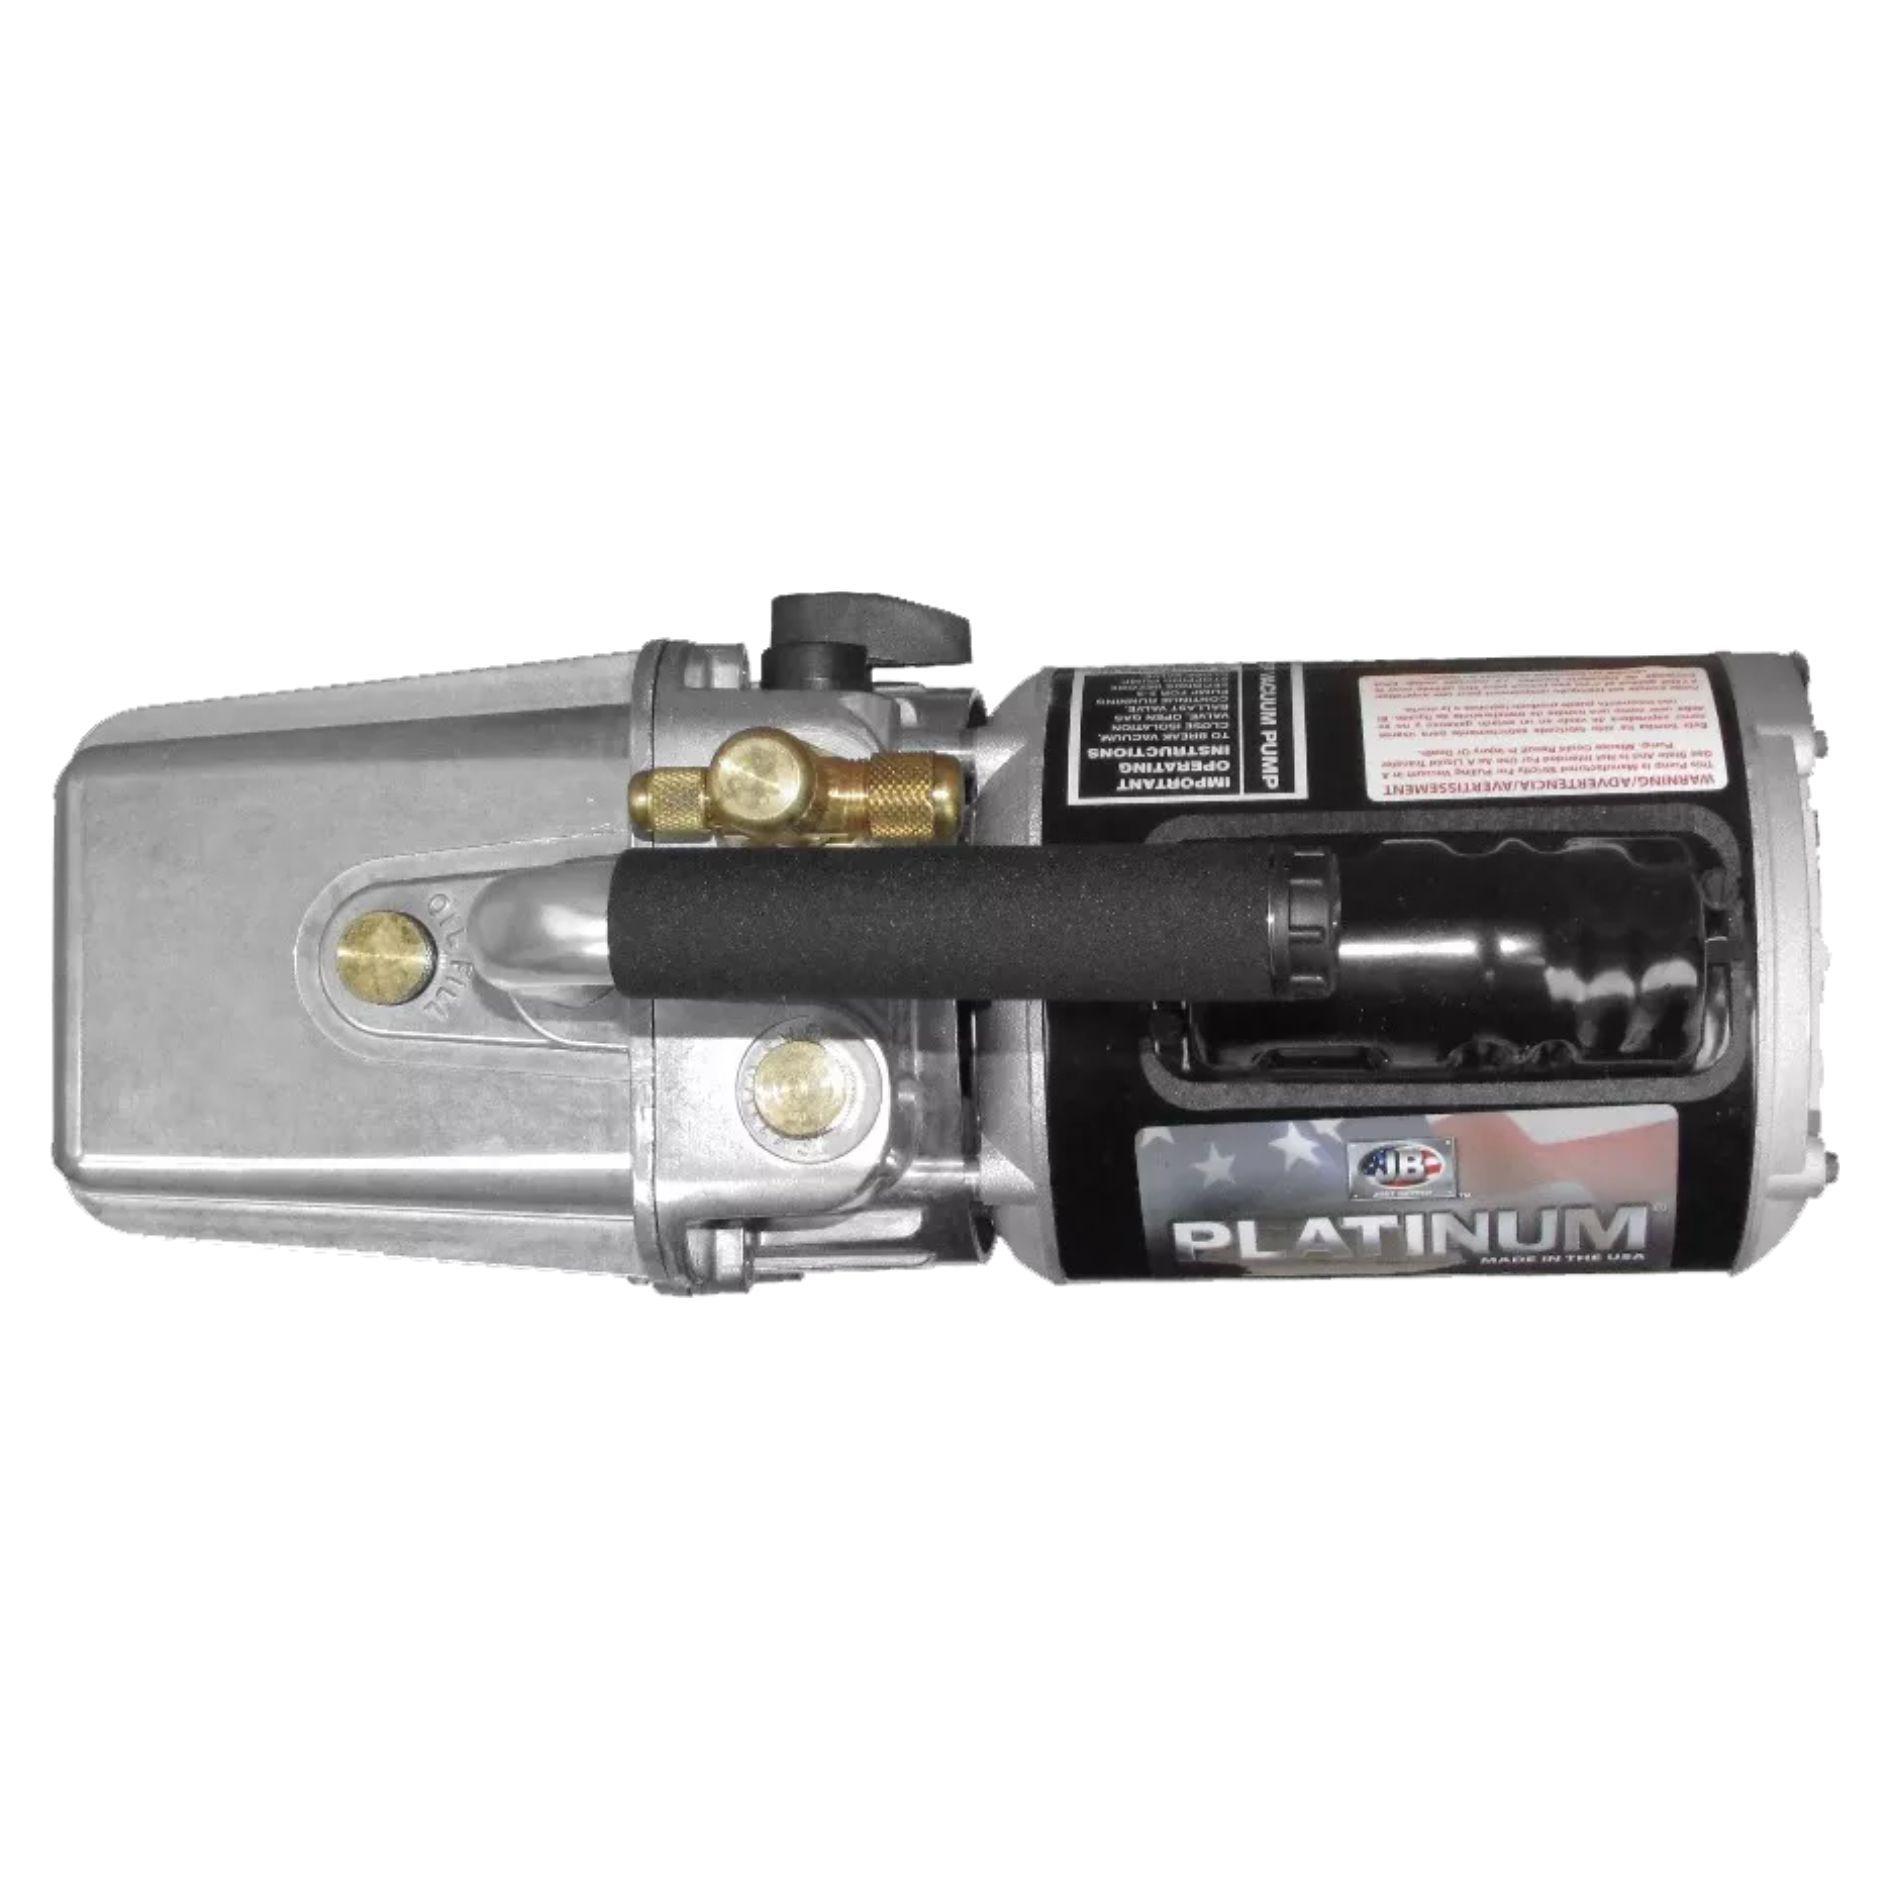 Bomba De Vácuo JB DV 285N PLATINUM 10Cfm 2 Estágios Bivolt